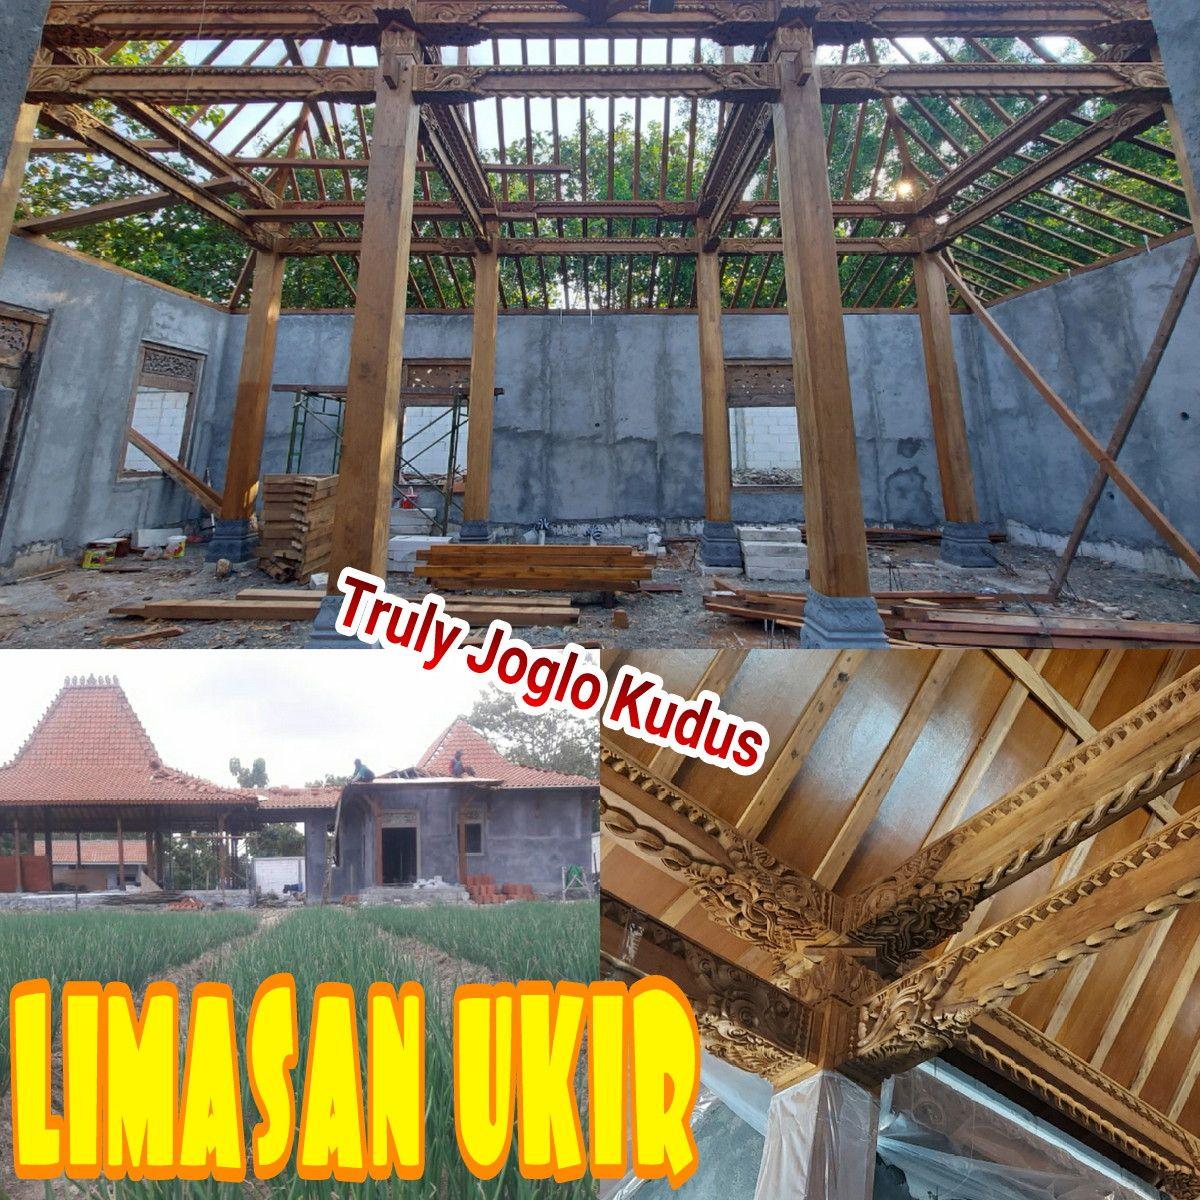 Project Truly Joglo Kudus Bangun Rumah Limasan Ukir Soko 22cm Dan Pendopo Joglo Ukir Soko 20cm Jati Lawas Recycled Di Yogyakarta Kayu Jati Rumah Kayu